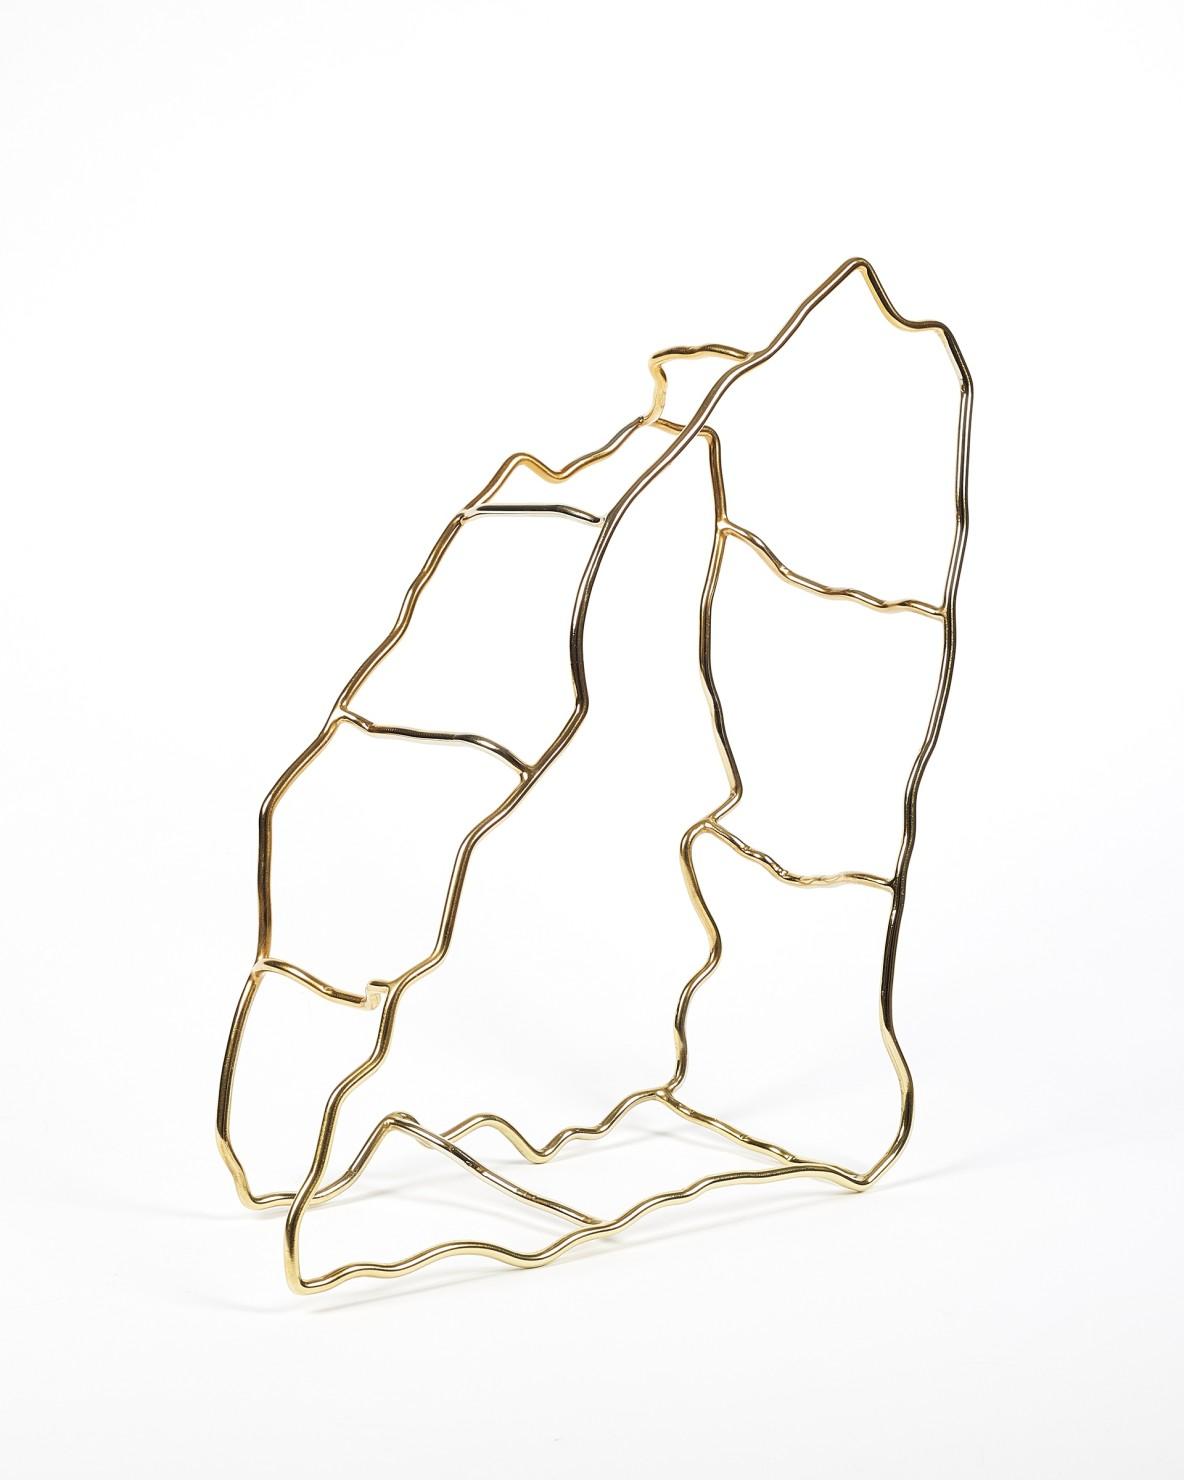 Will Nash  Gold Fragment, 2018